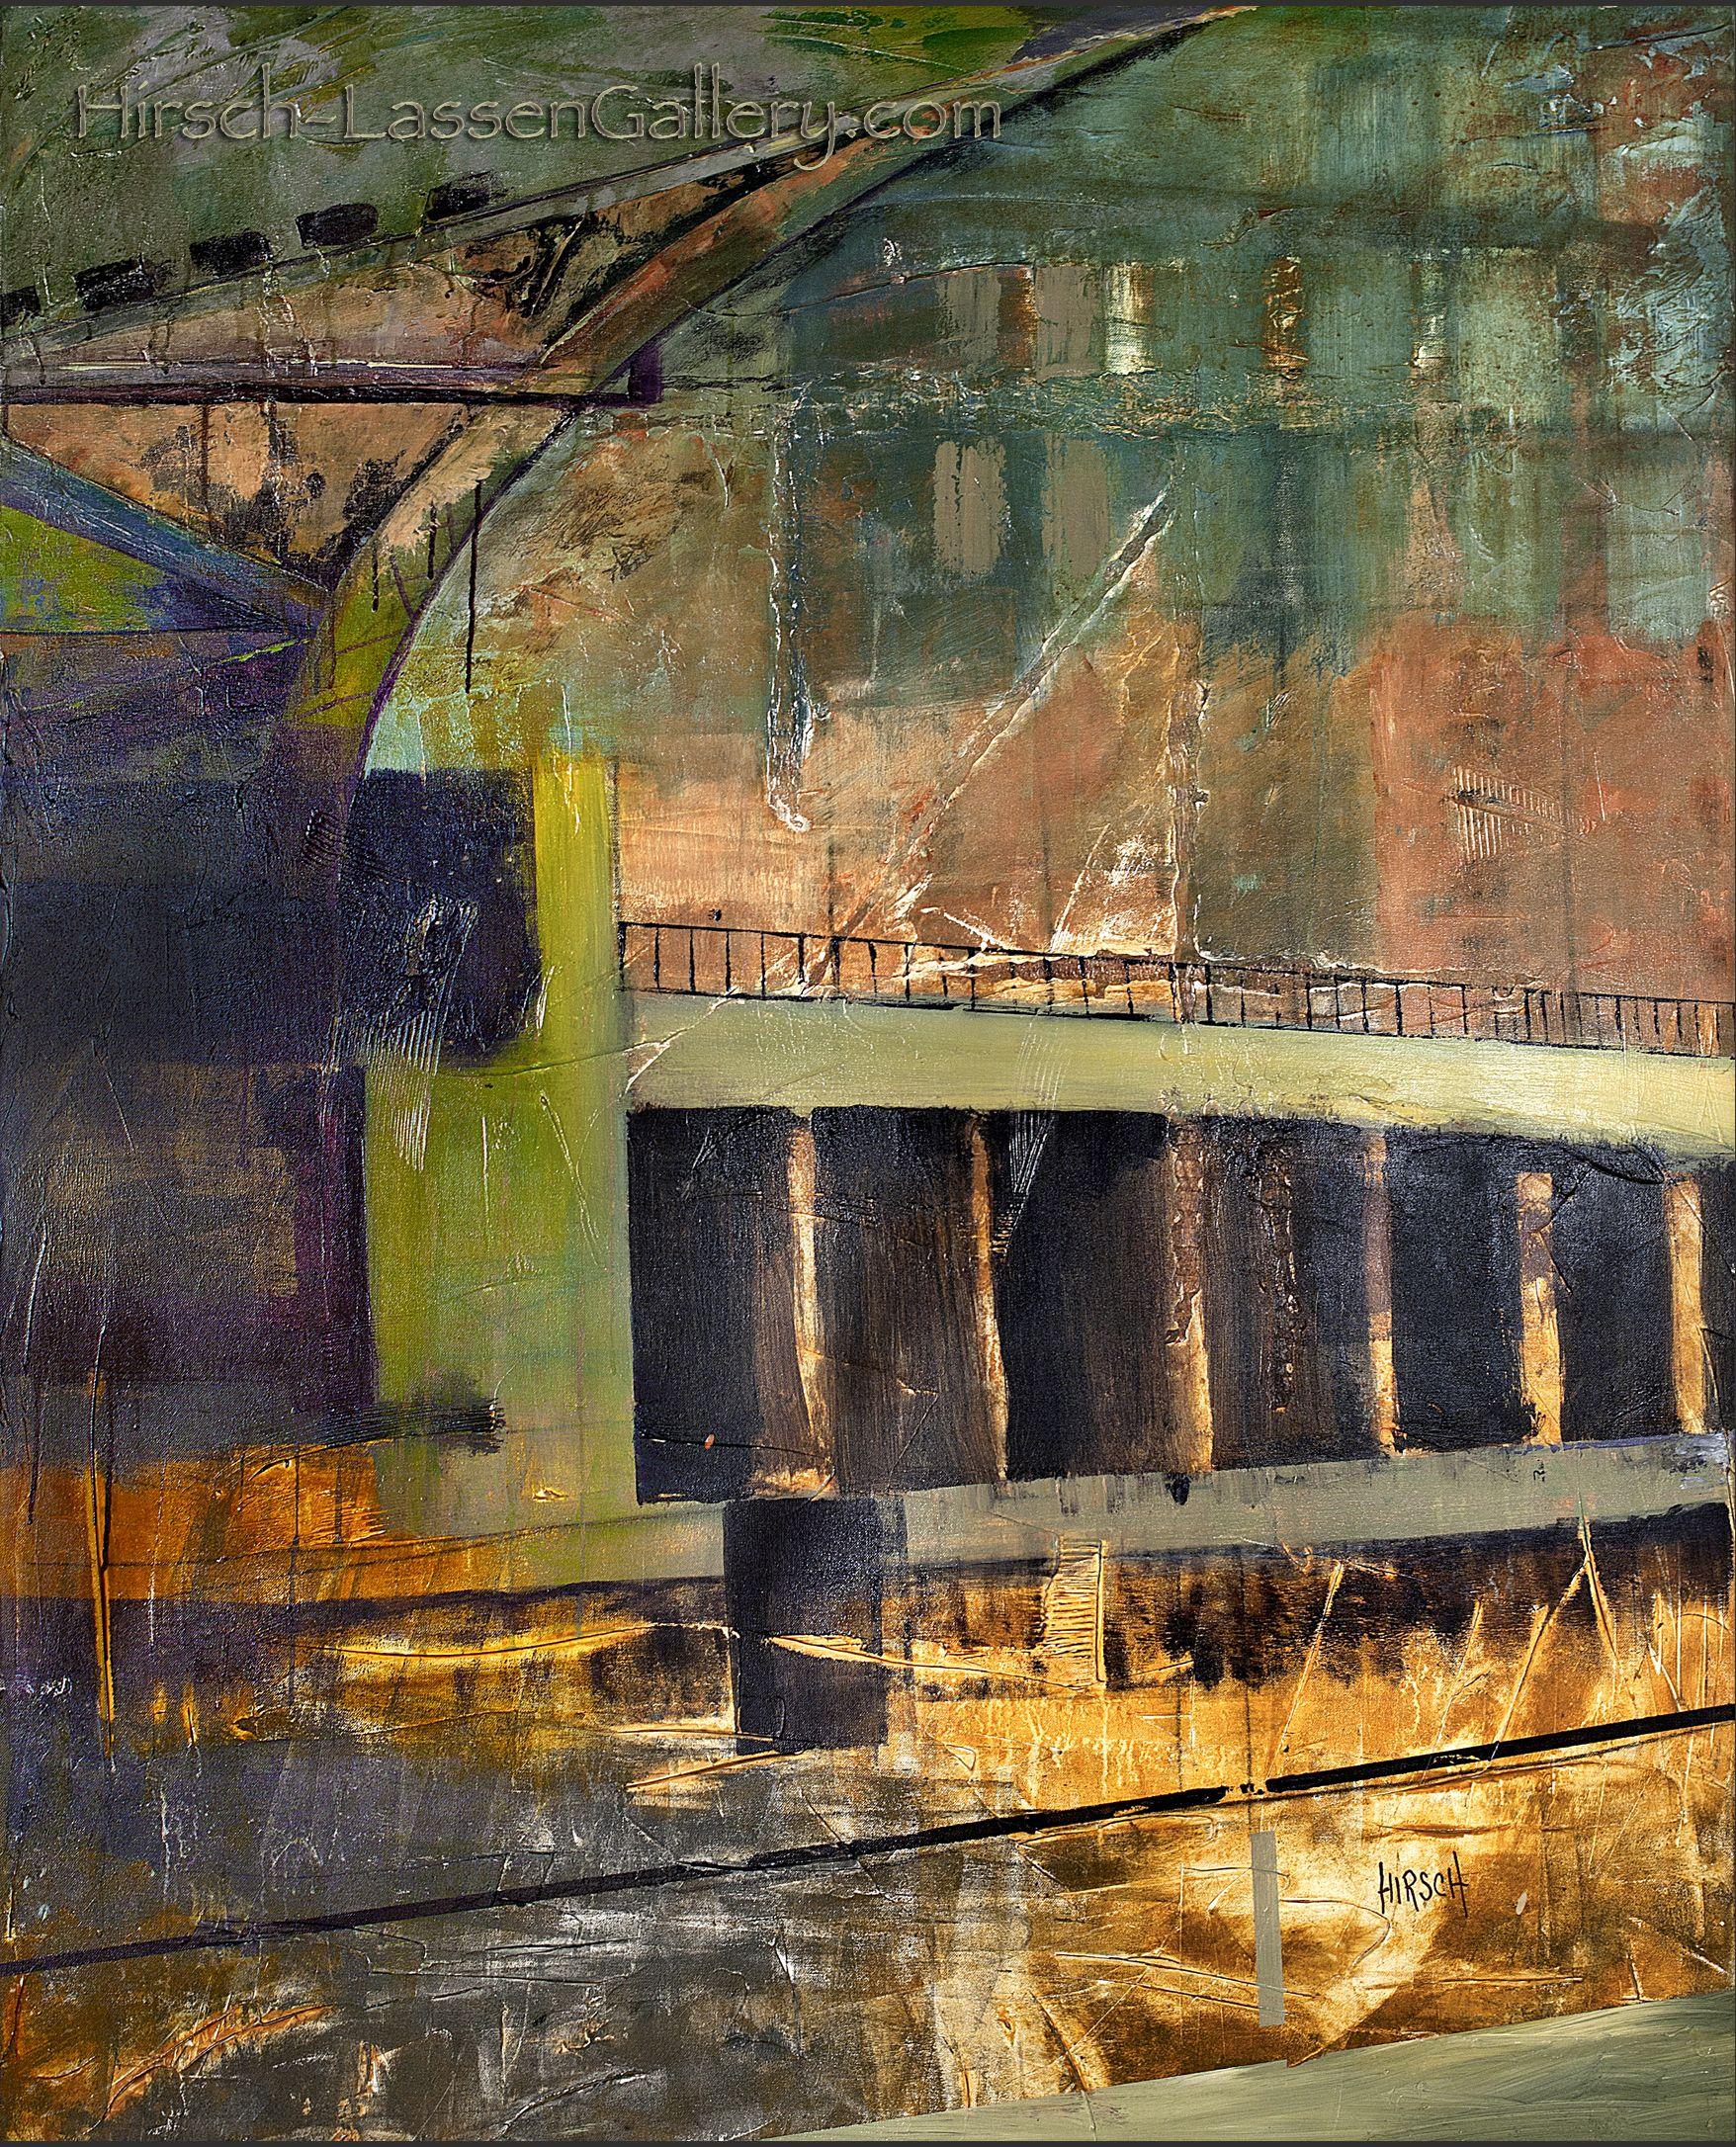 Chicago Bridge. 2012.     Nancy Hirsch-Lassen  Hirsch-LassenGallery.com